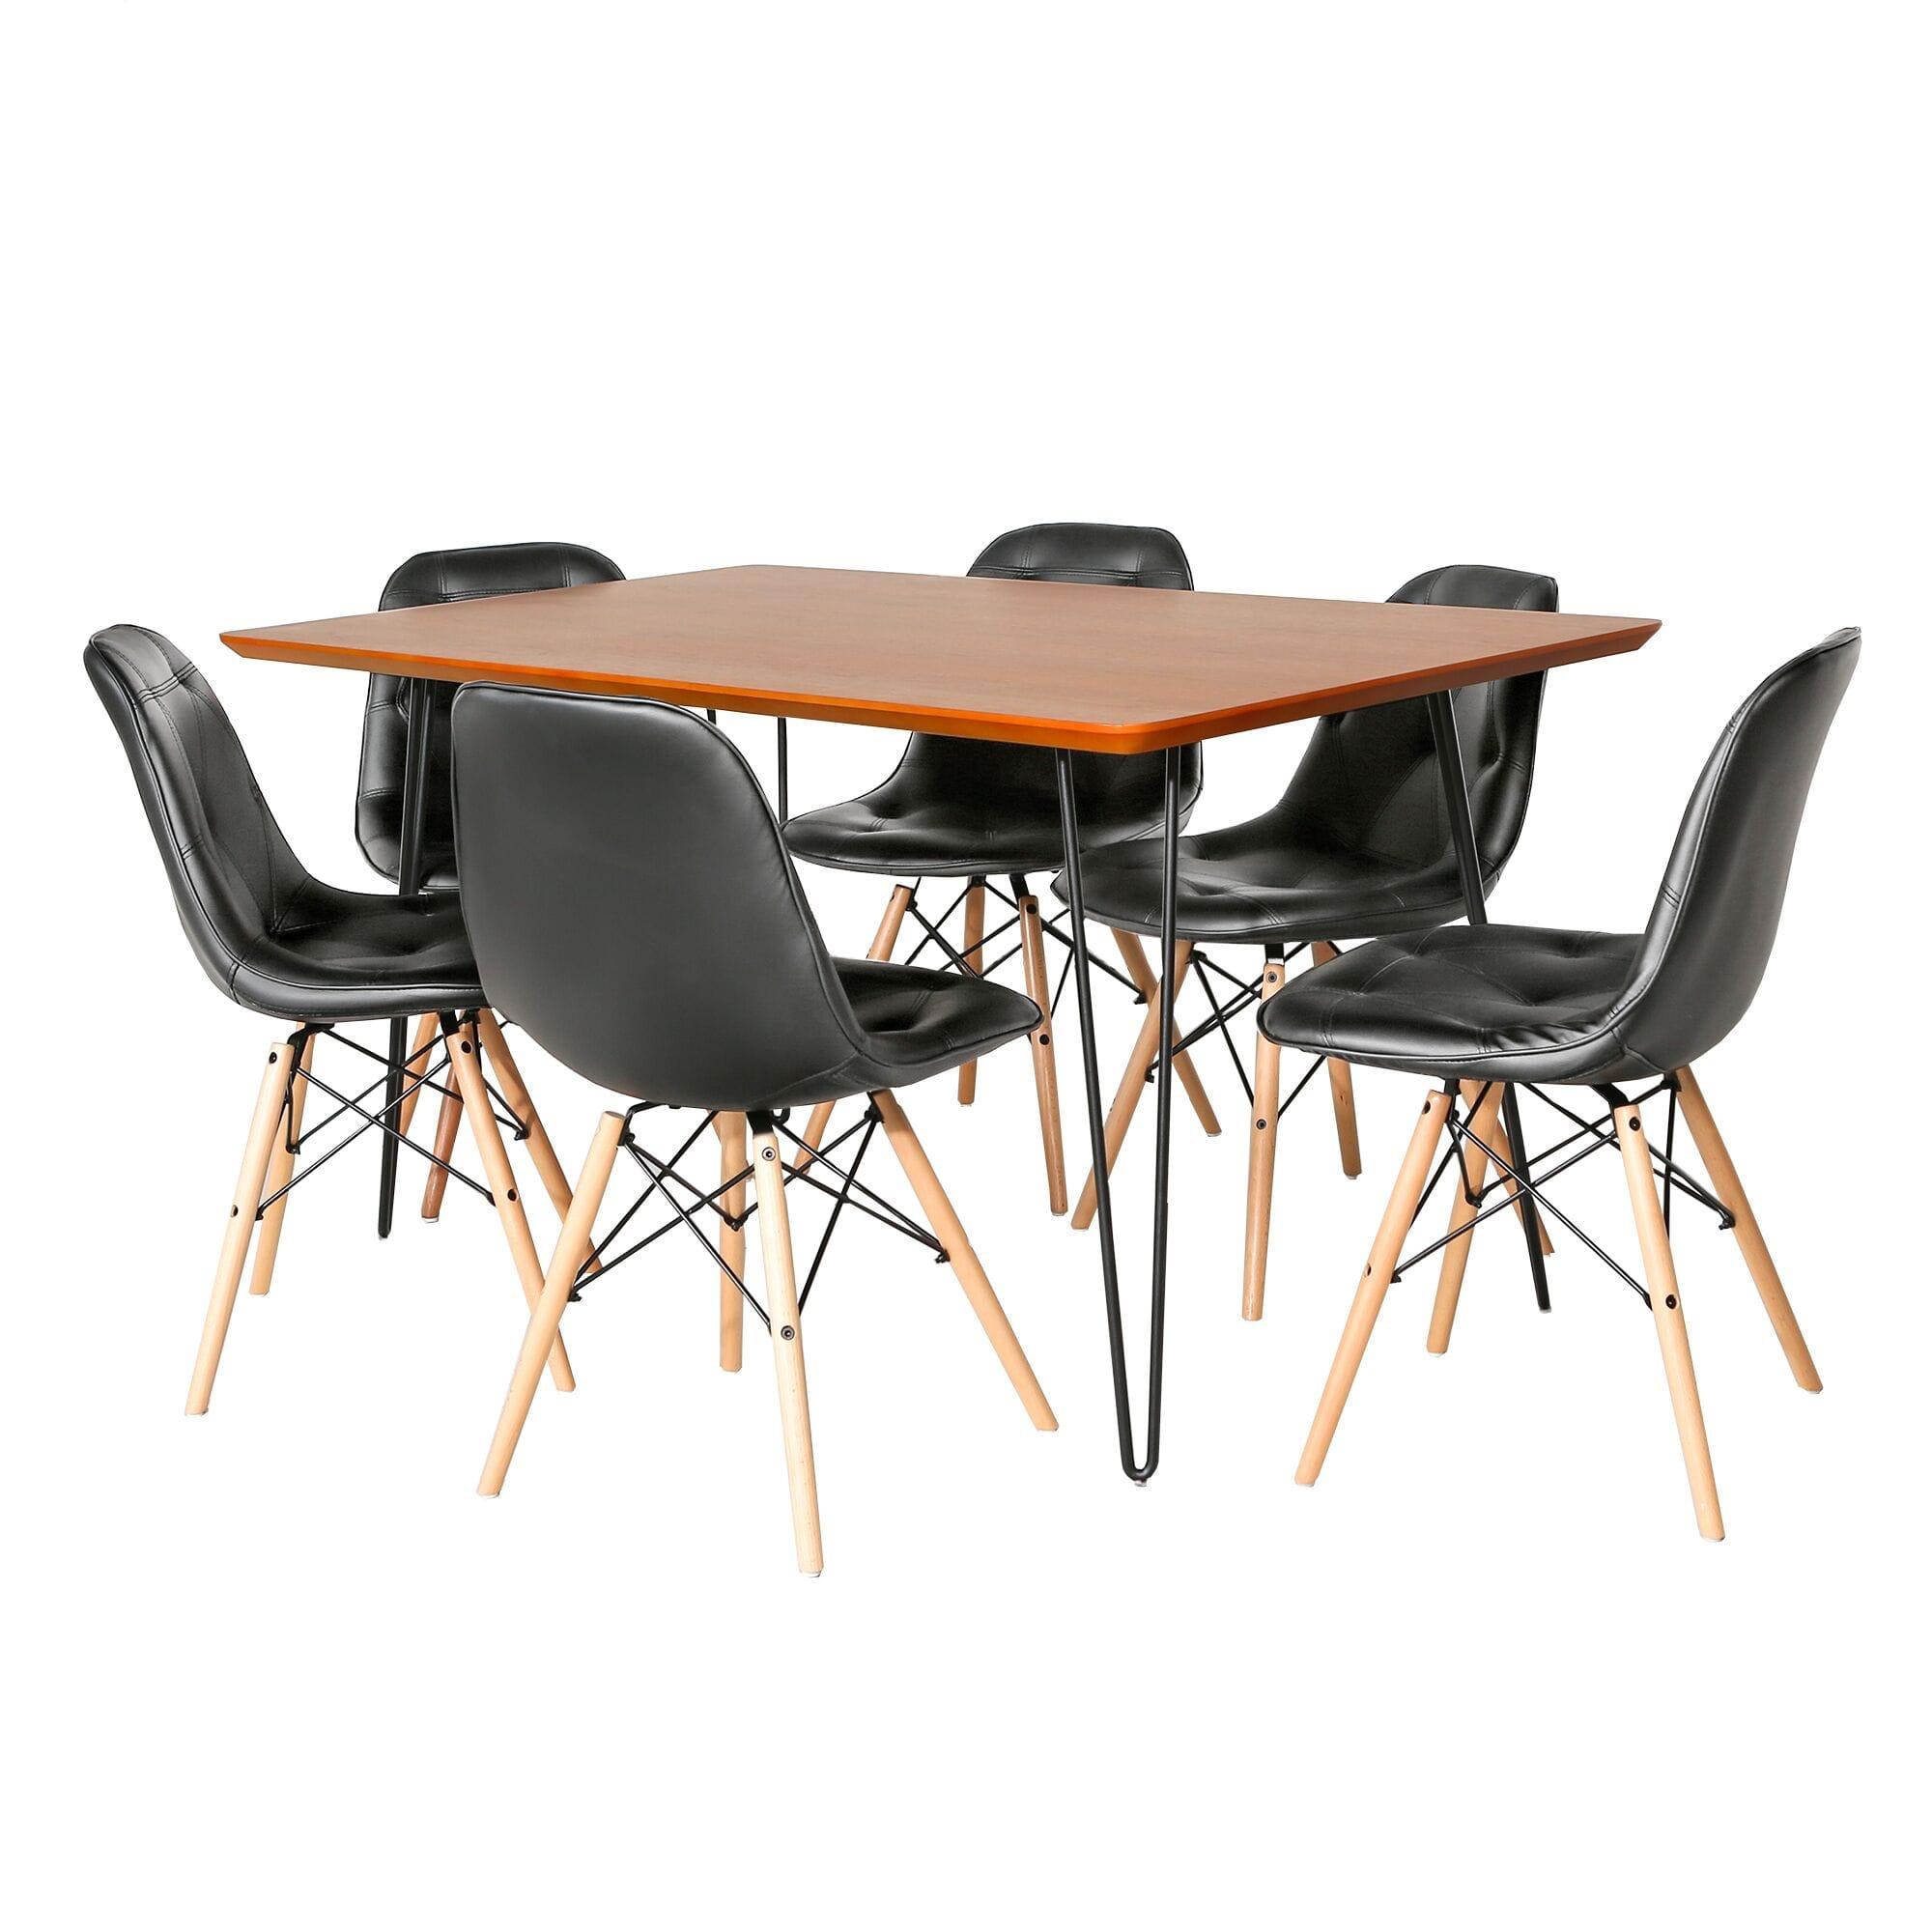 7 Piece Mid Century Modern Wood Dining Table Set Walnut Black By Walker Edison